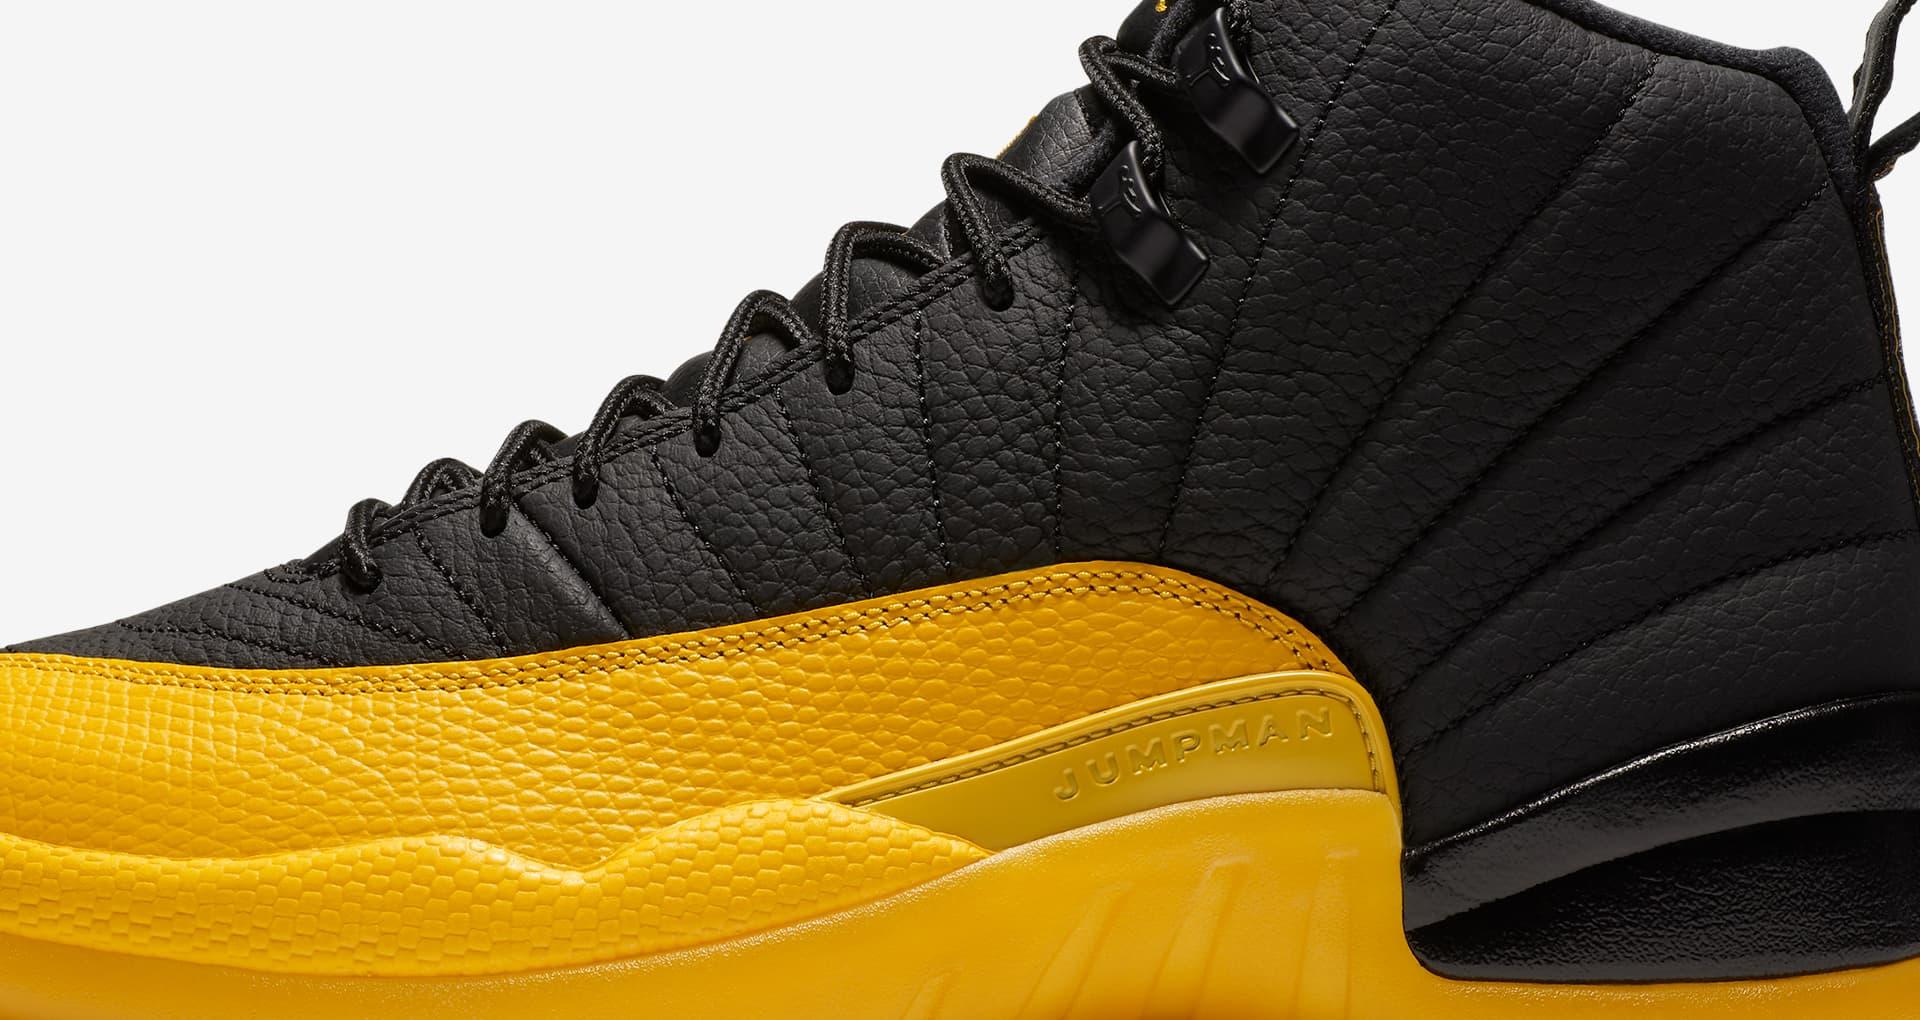 A Closer Look At The Air Jordan 12 University Gold